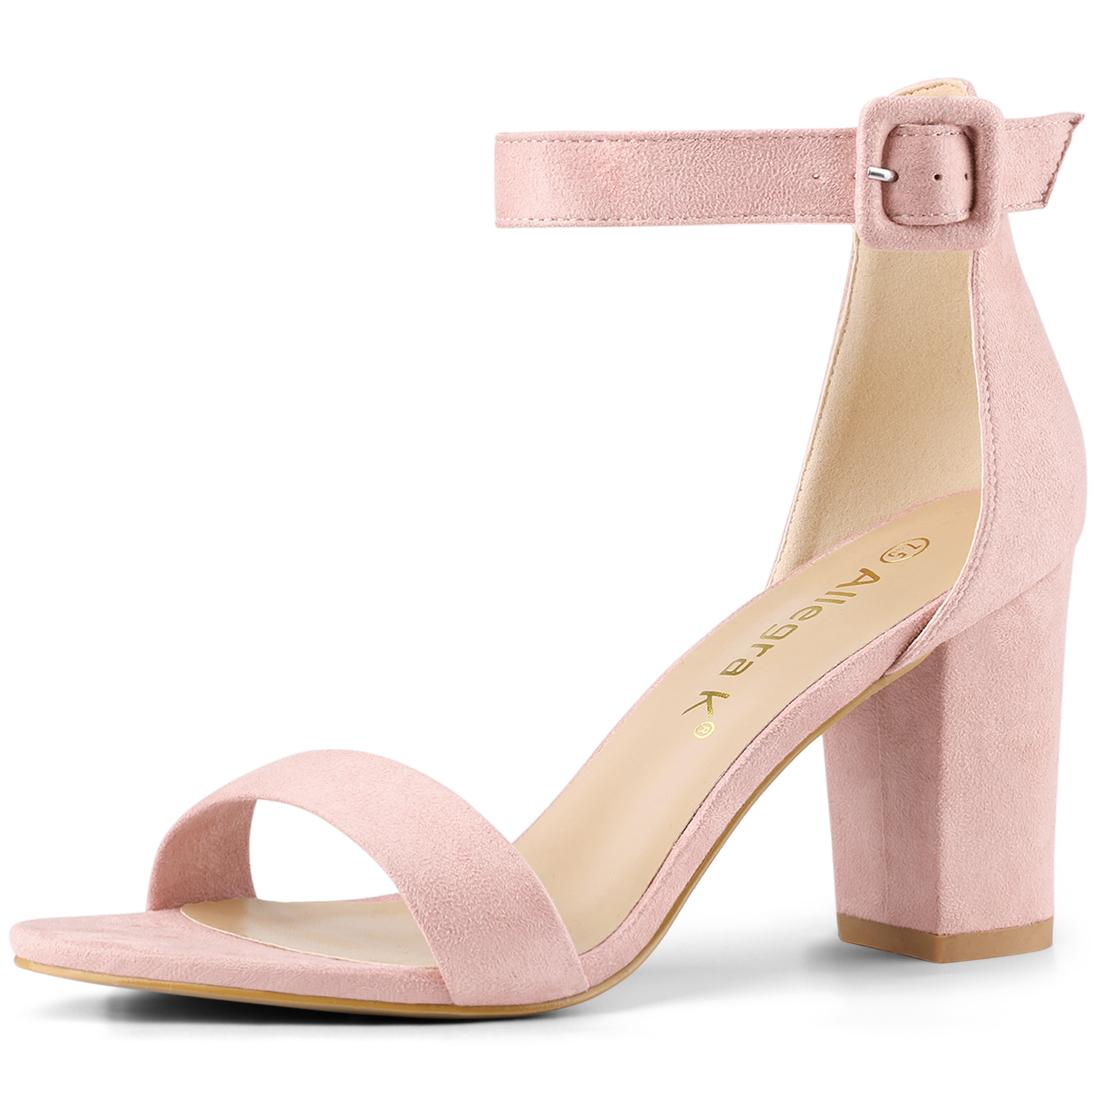 Allegra K Women's Chunky High Heel Ankle Strap Sandals Light Pink US 7.5